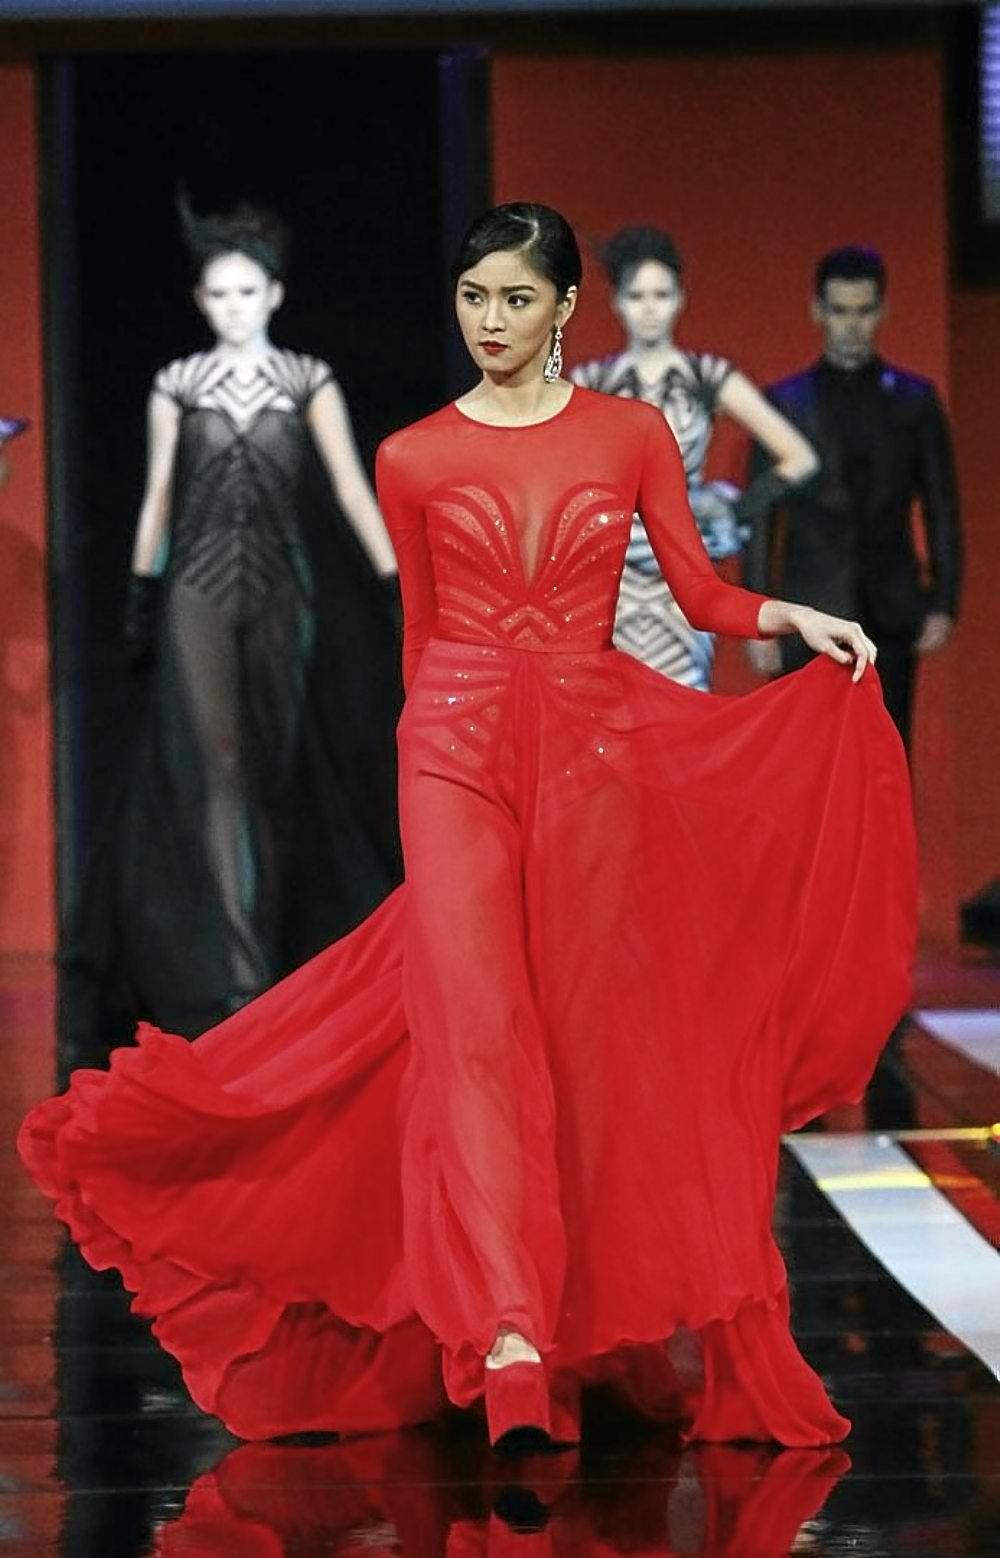 8b8d170b94 Kim Chiu in a hot red long gown. Stunning!